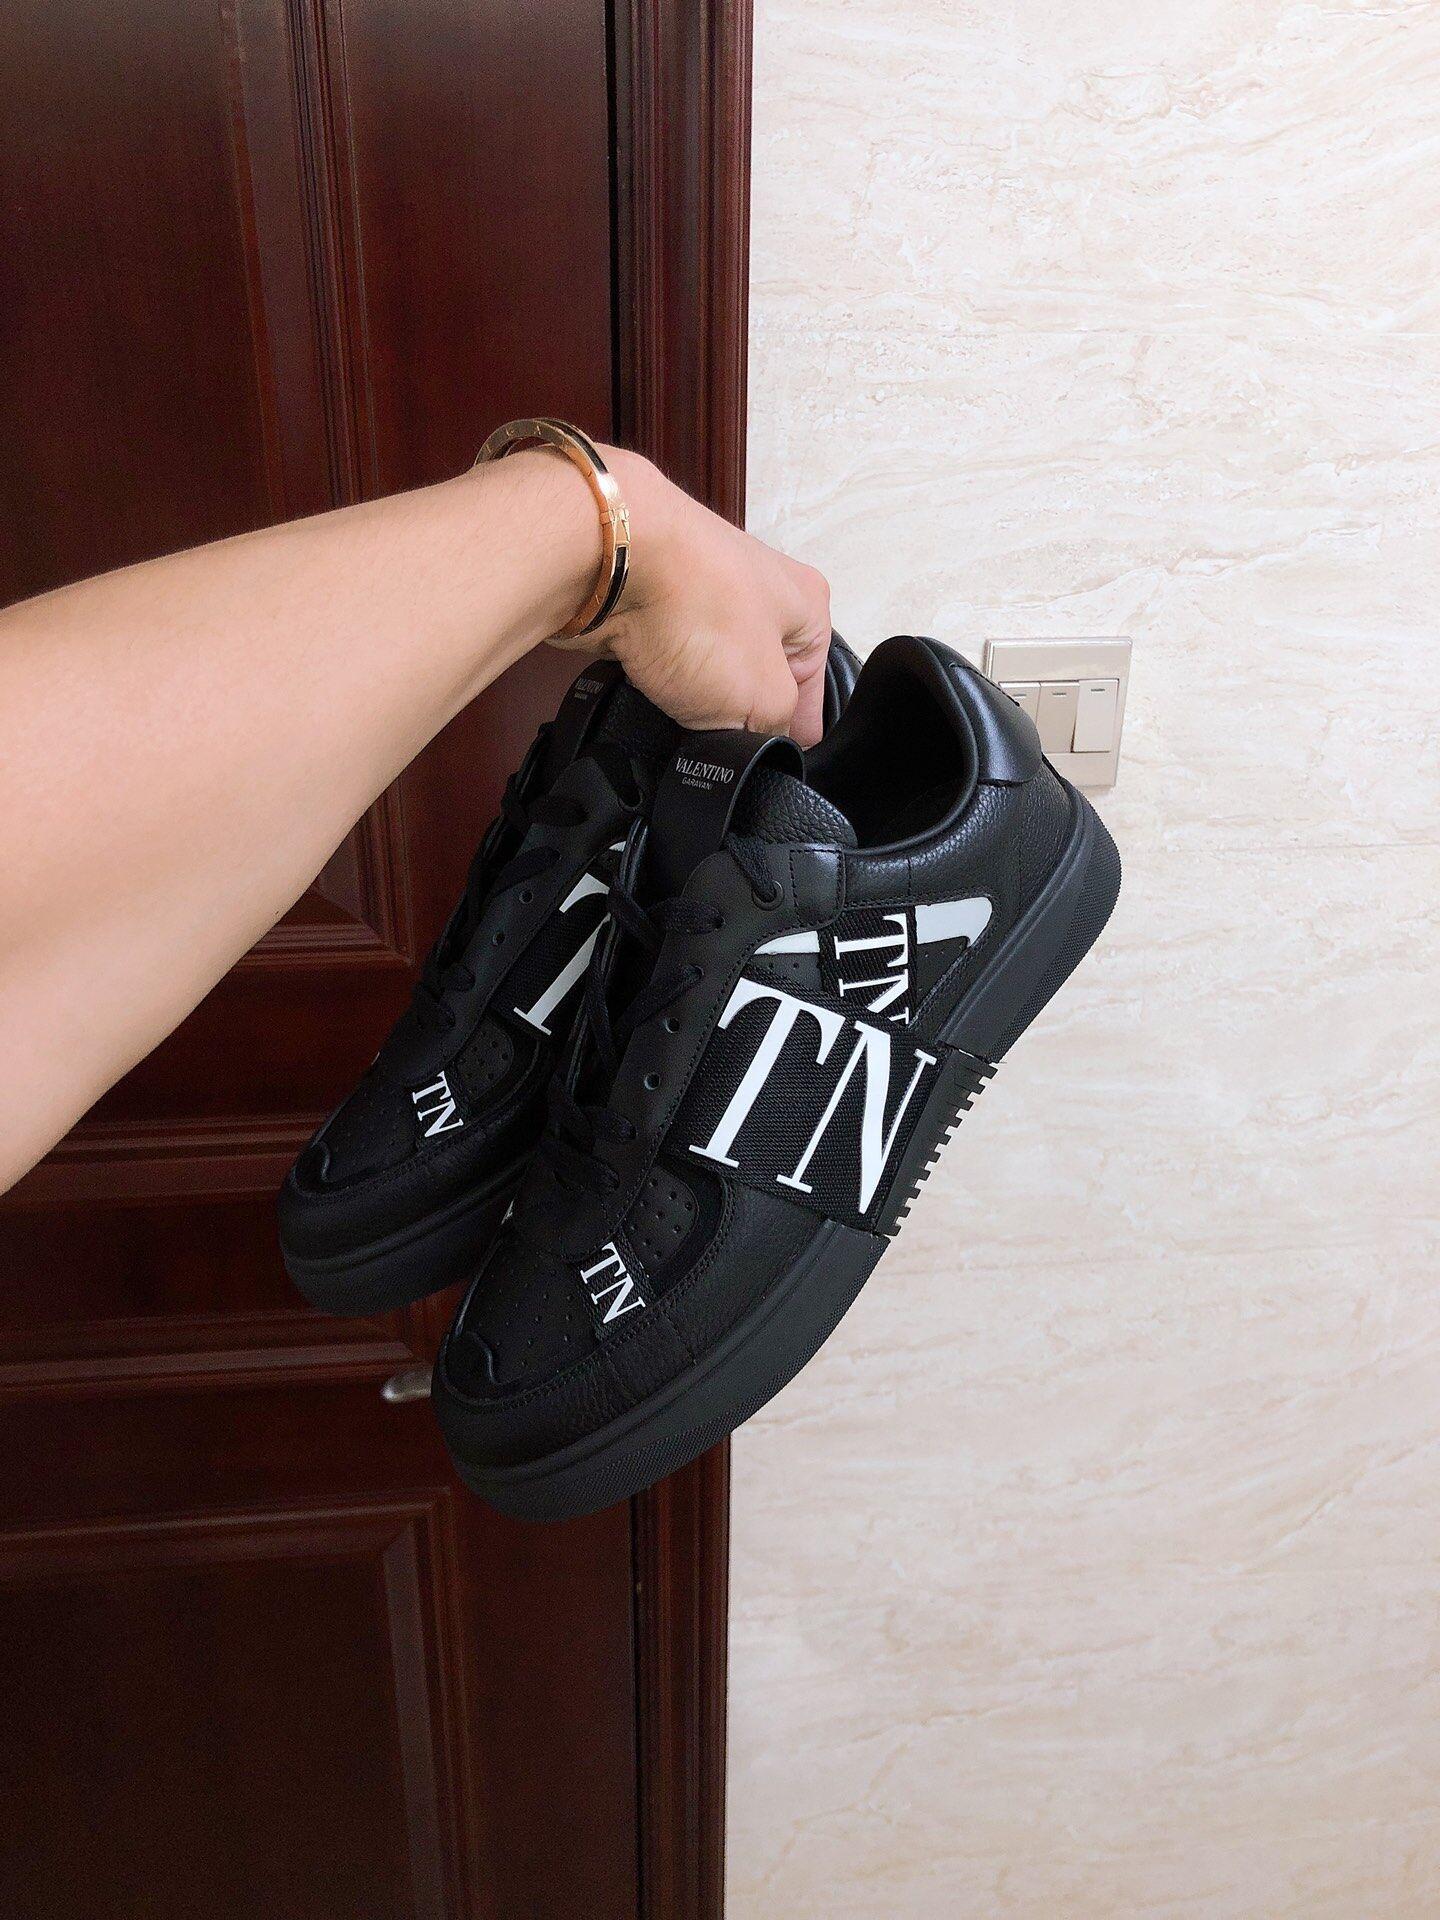 GARAVANI CALFSKIN VL7N SNEAKER WITH BANDS           shoes snekaer  7